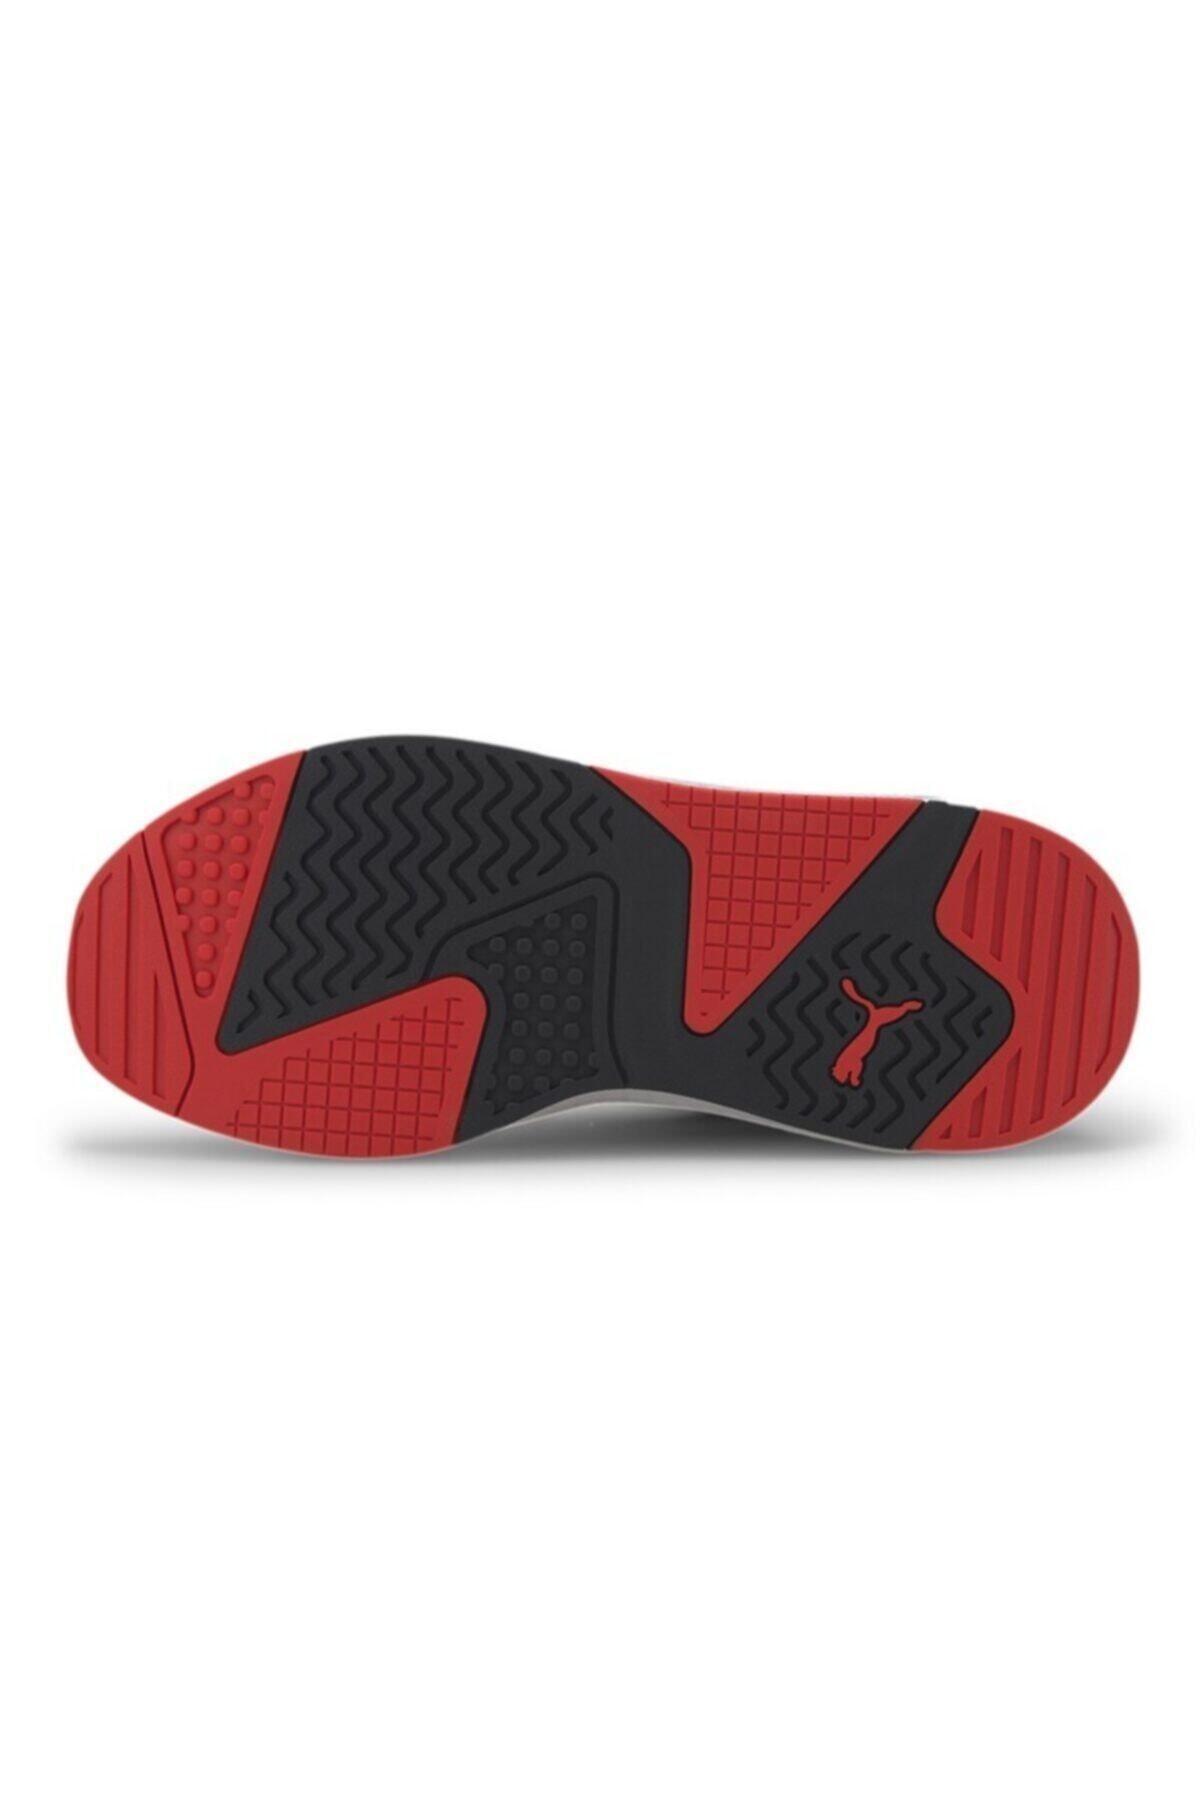 Puma X-RAY Lacivert Erkek Sneaker Ayakkabı 100532369 2